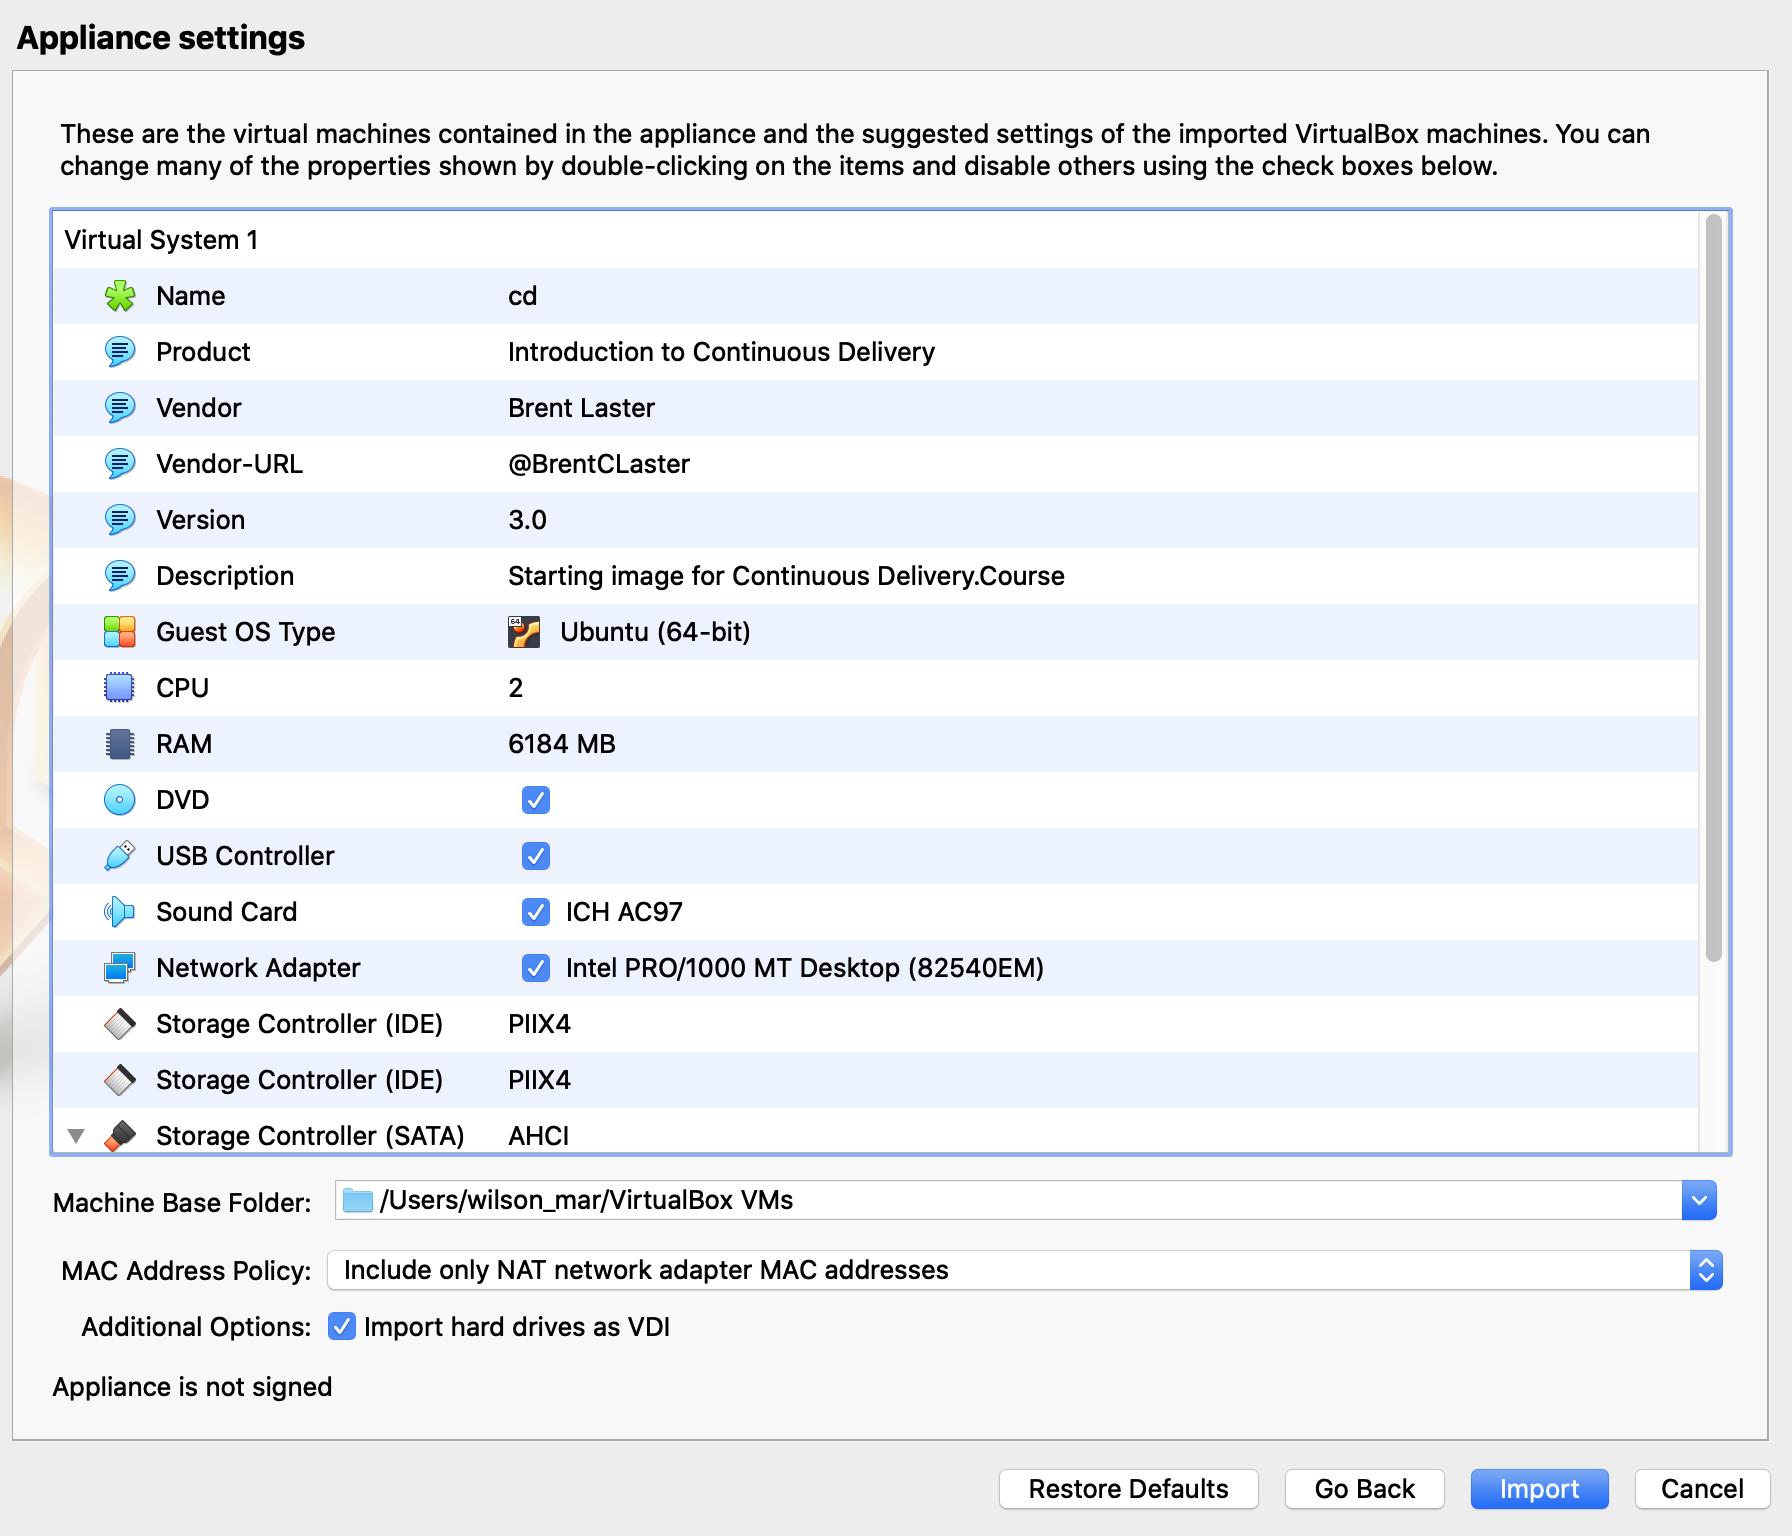 virtualbox-appliance-settings